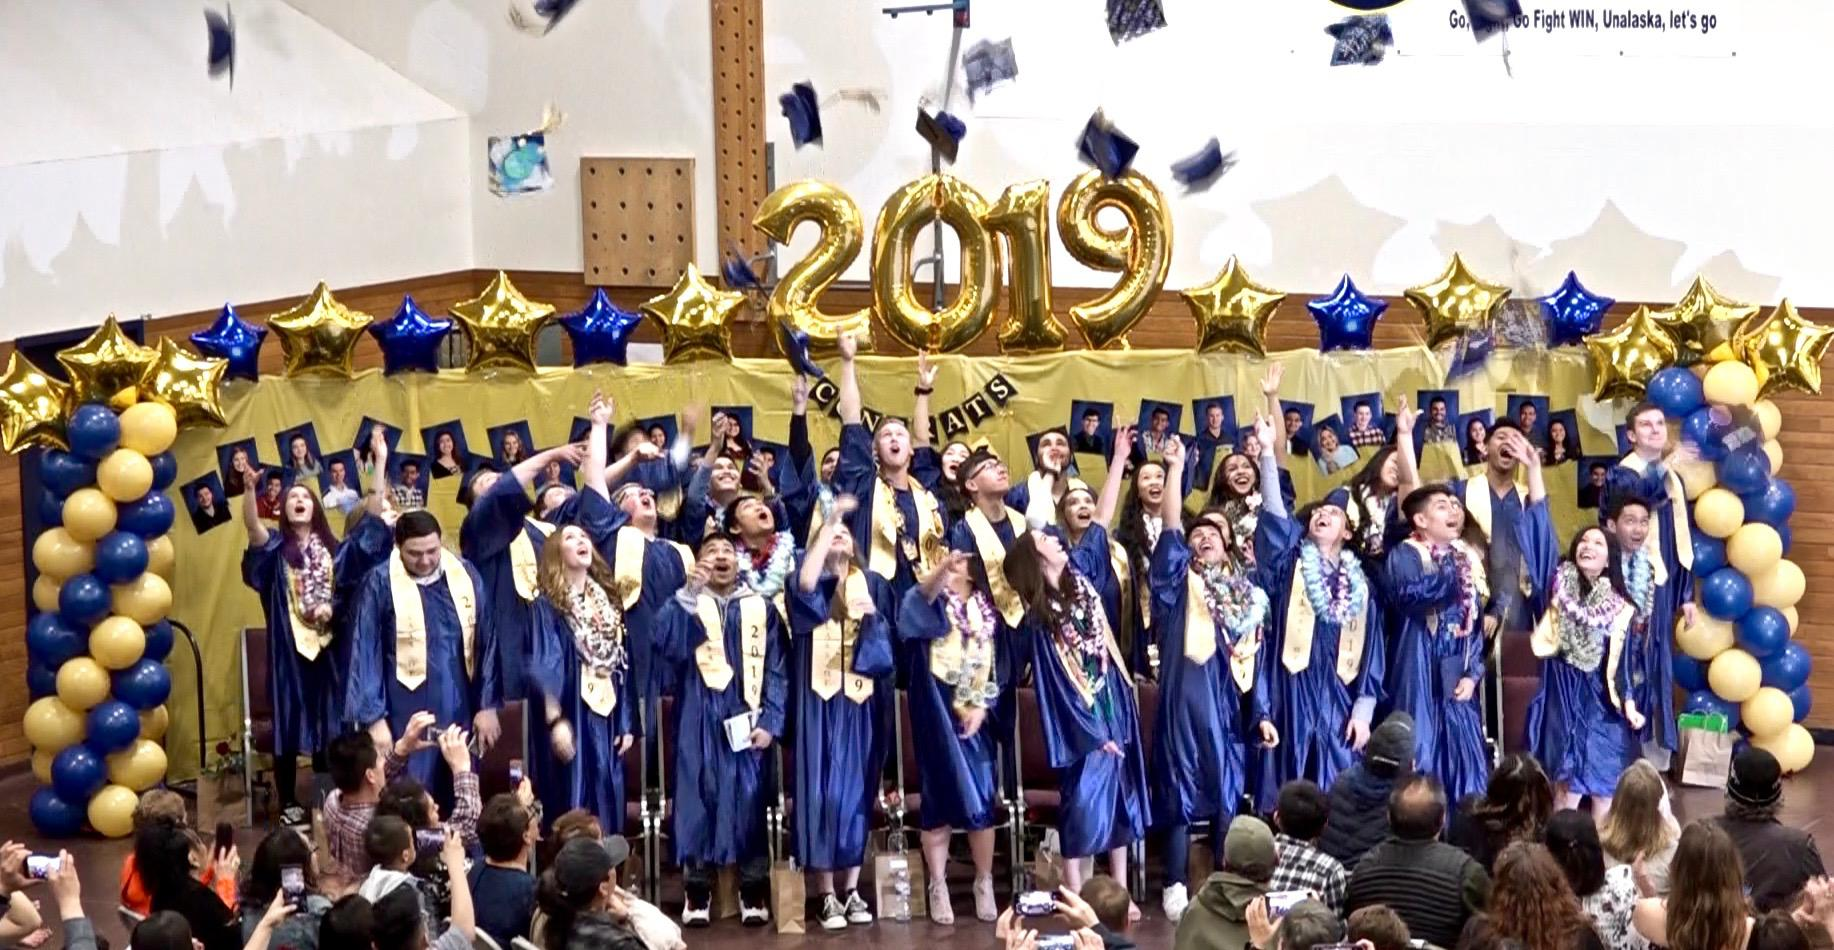 Ucsd Academic Calendar 2019.Unalaska Graduates Thirty Four Ucsd Students Kucb